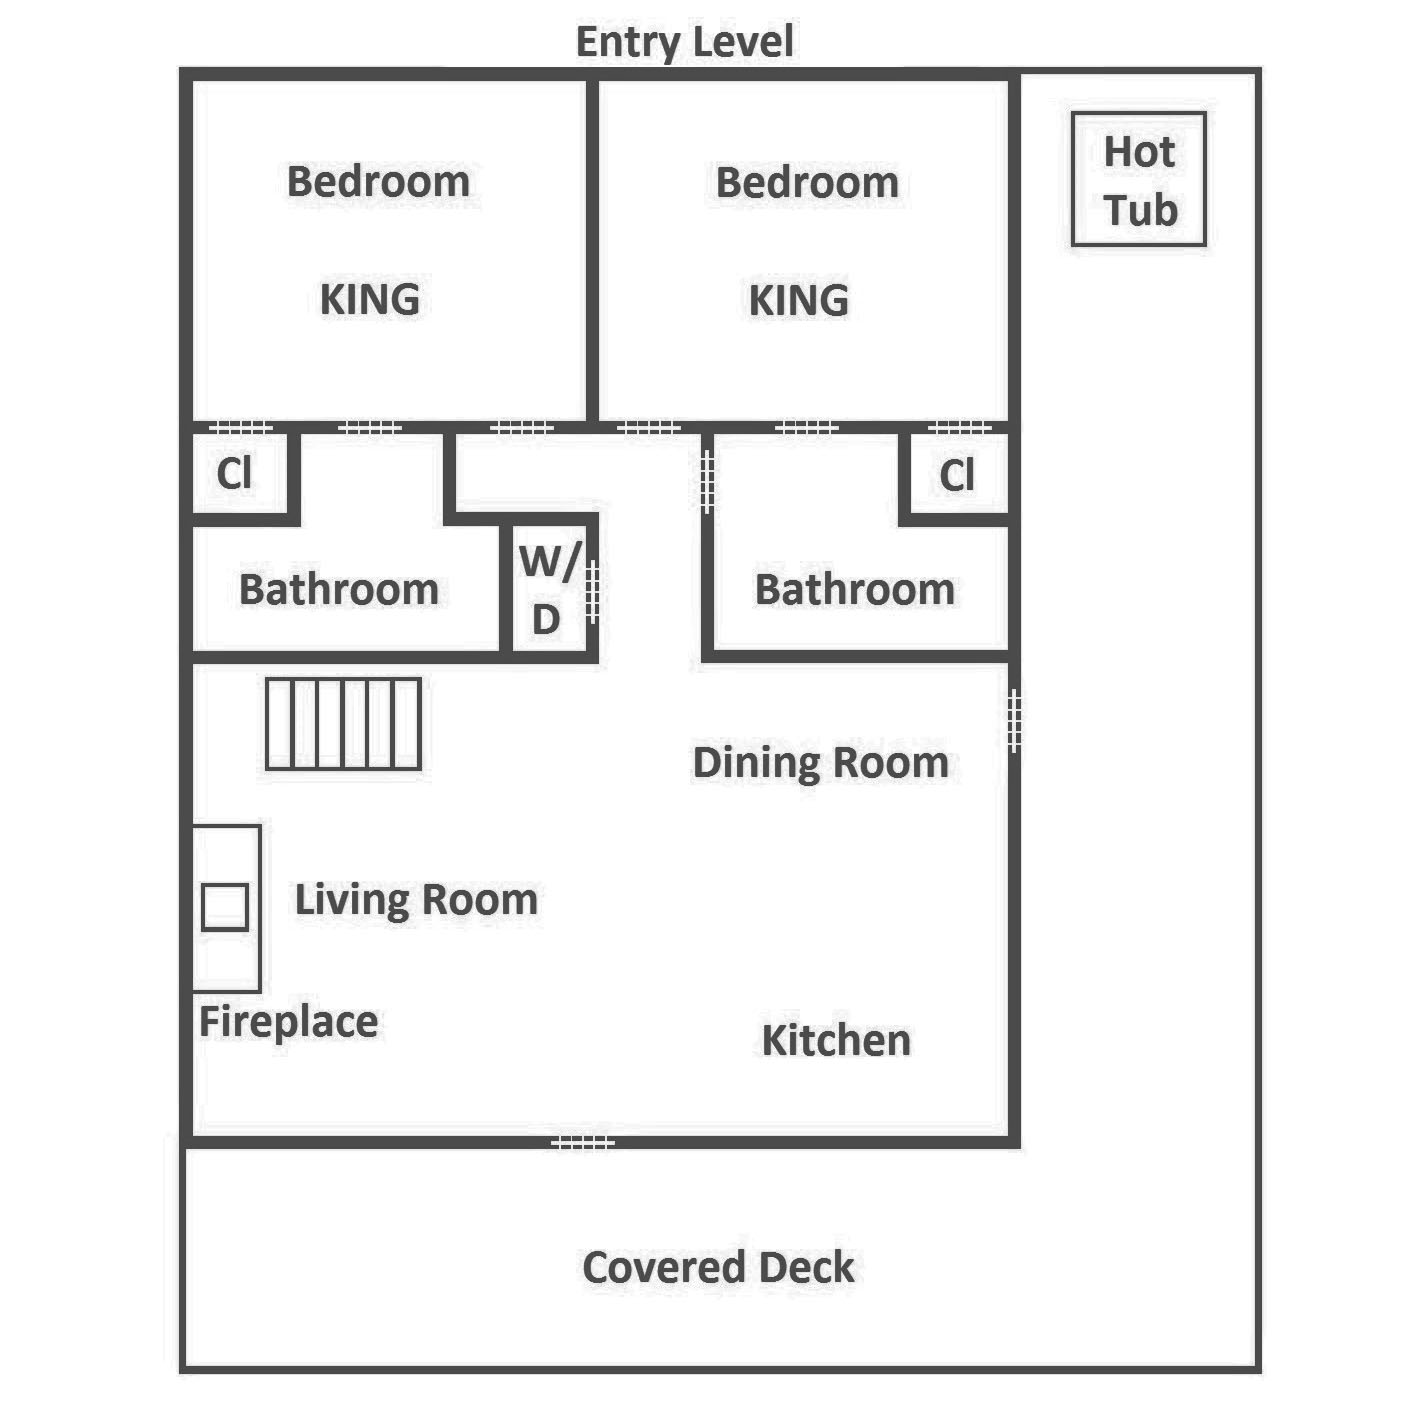 Keaton's Cozy Cabin - Entry Level